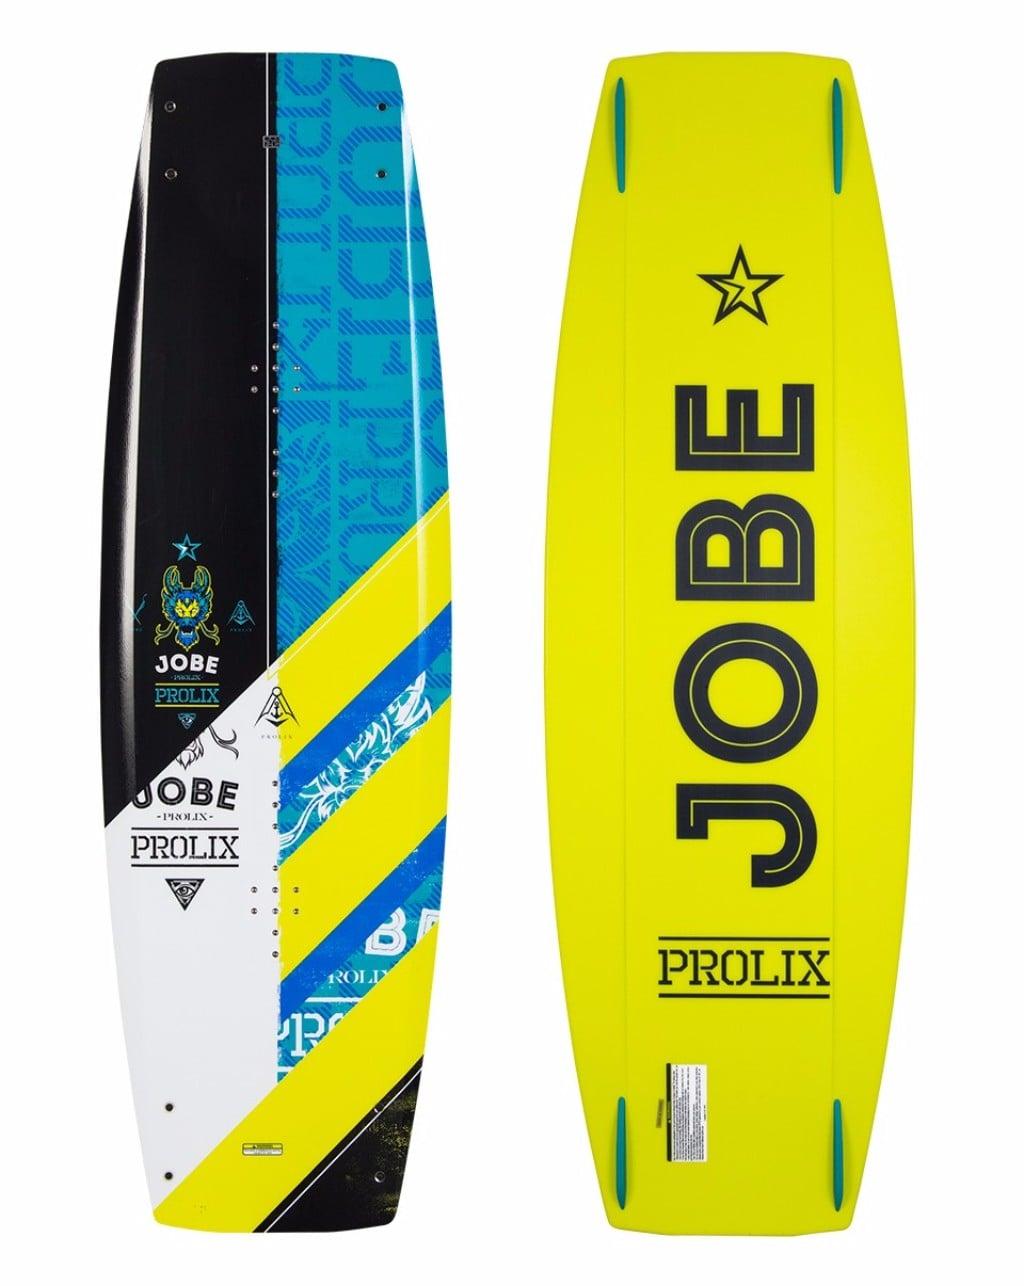 Jobe Prolix Boating Wakeboard Review